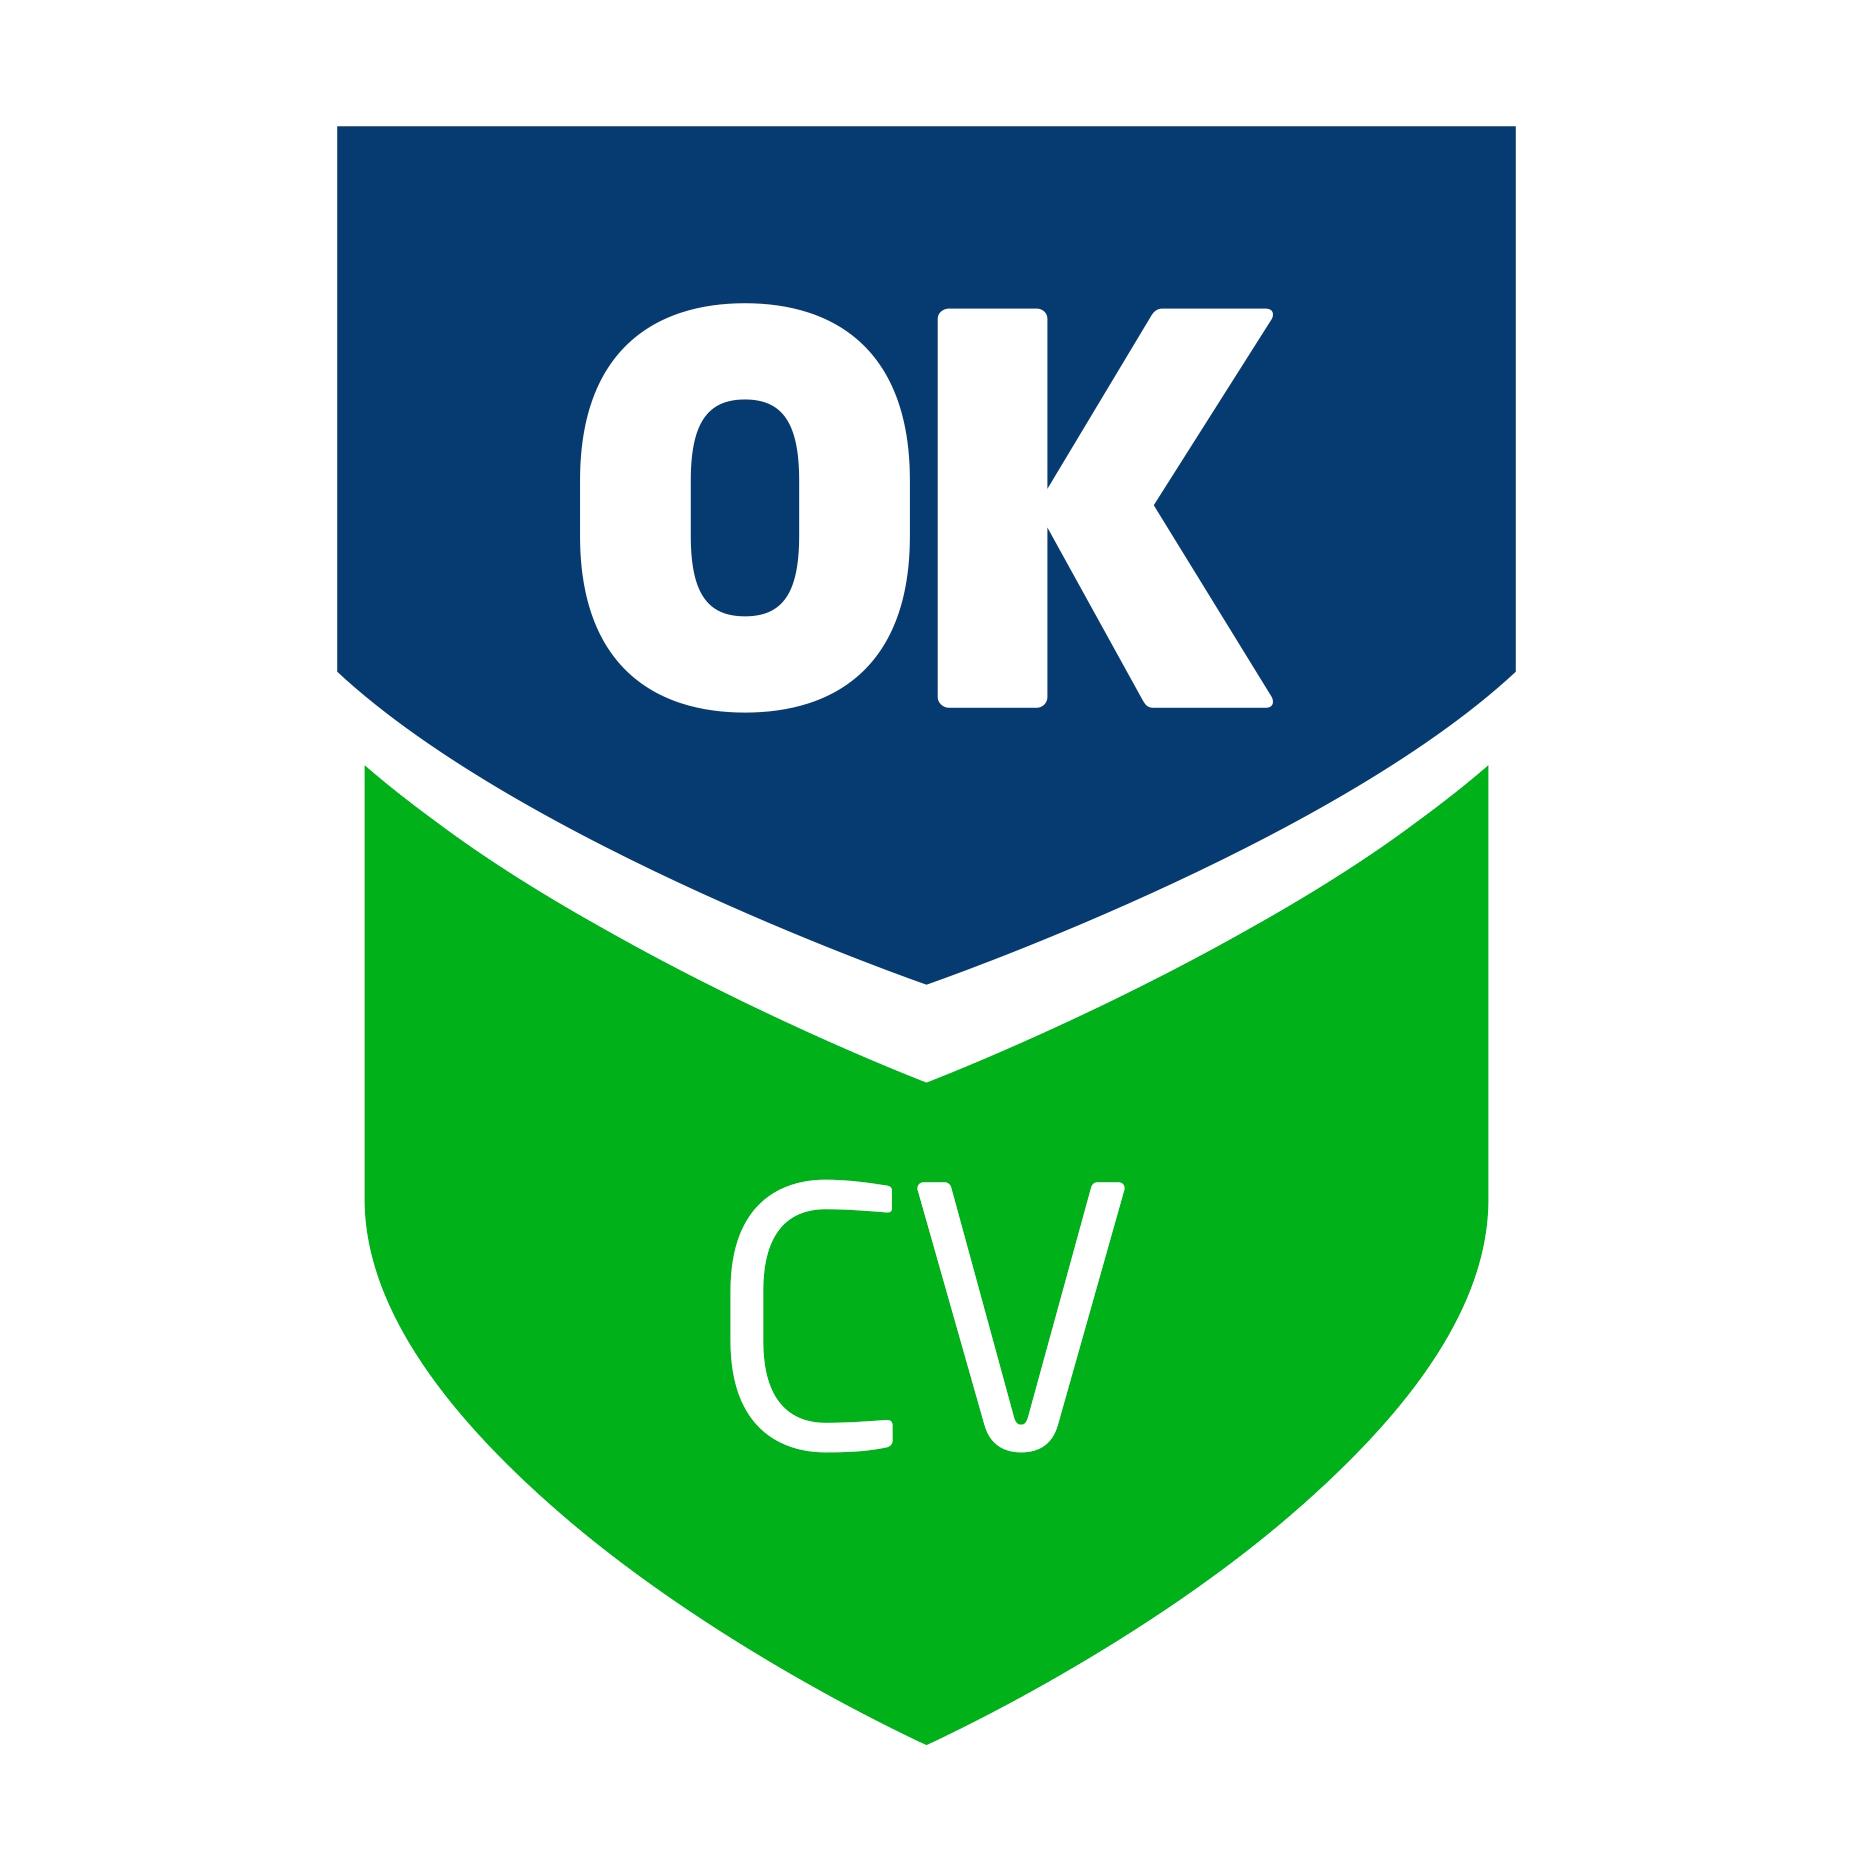 Cv ketel onderhoud | Consumentenbond